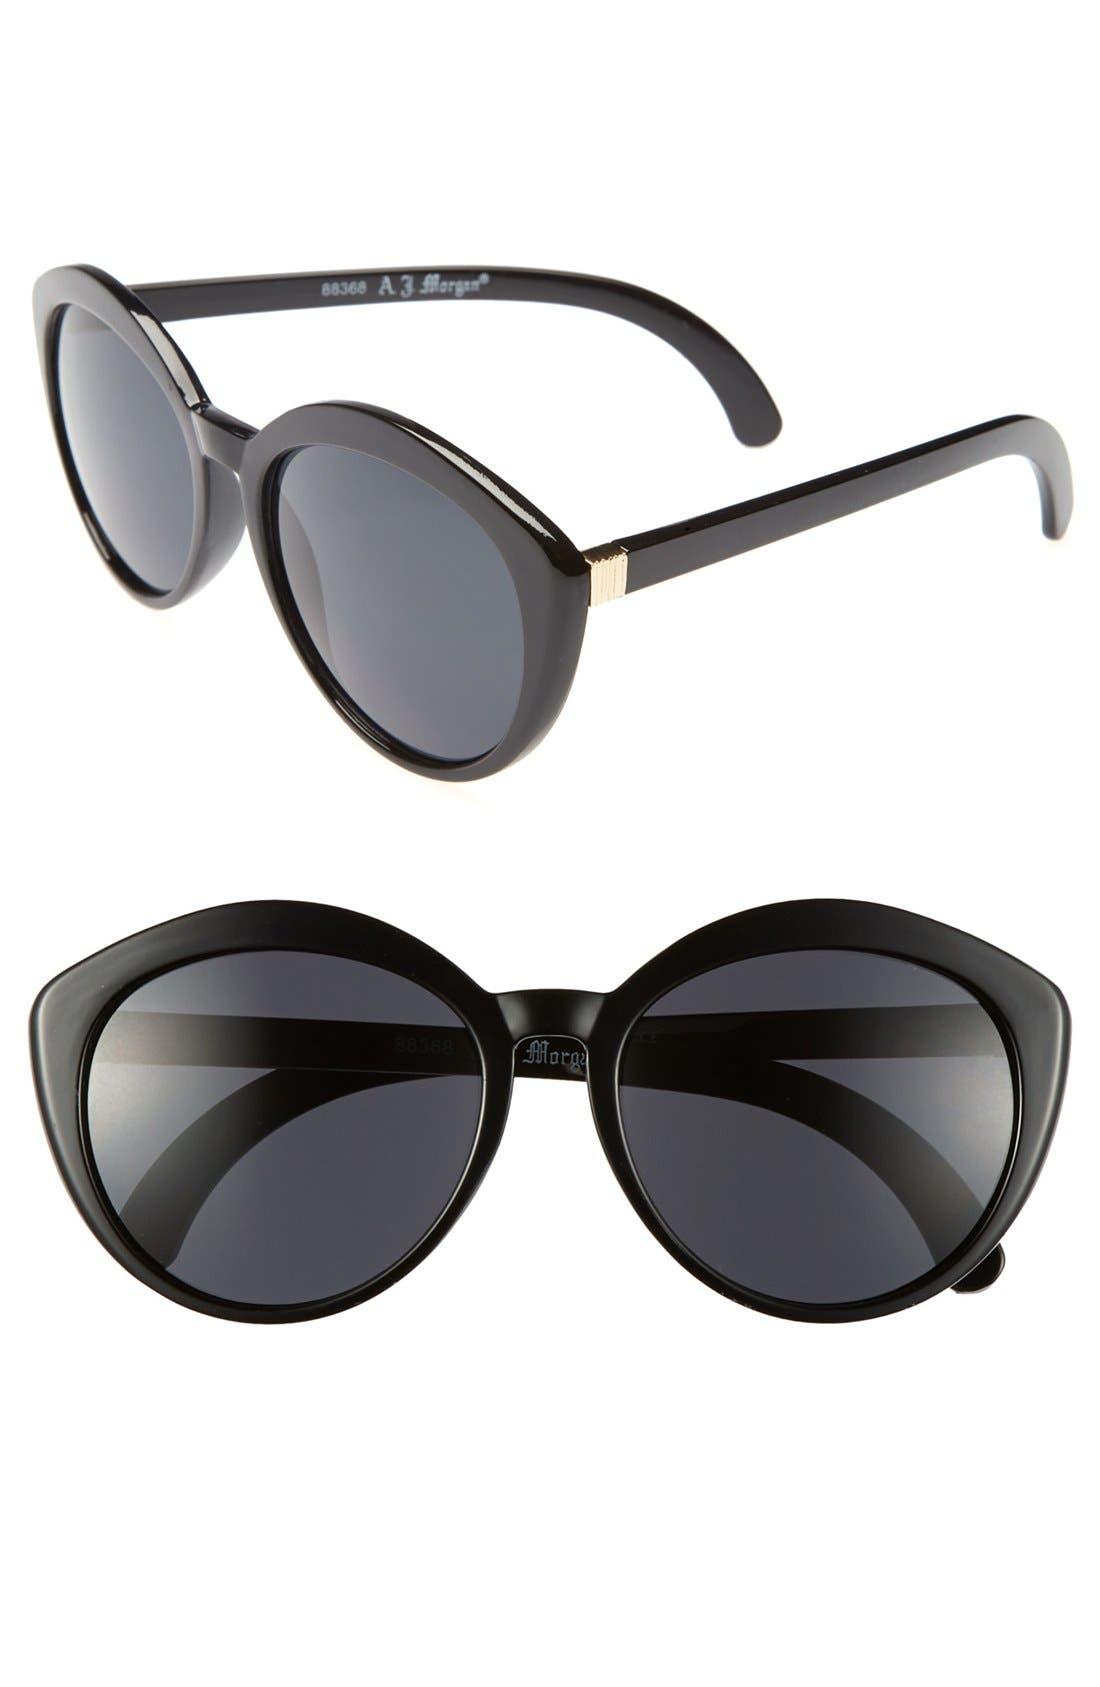 Alternate Image 1 Selected - A.J. Morgan 'Greta' 57mm Retro Sunglasses